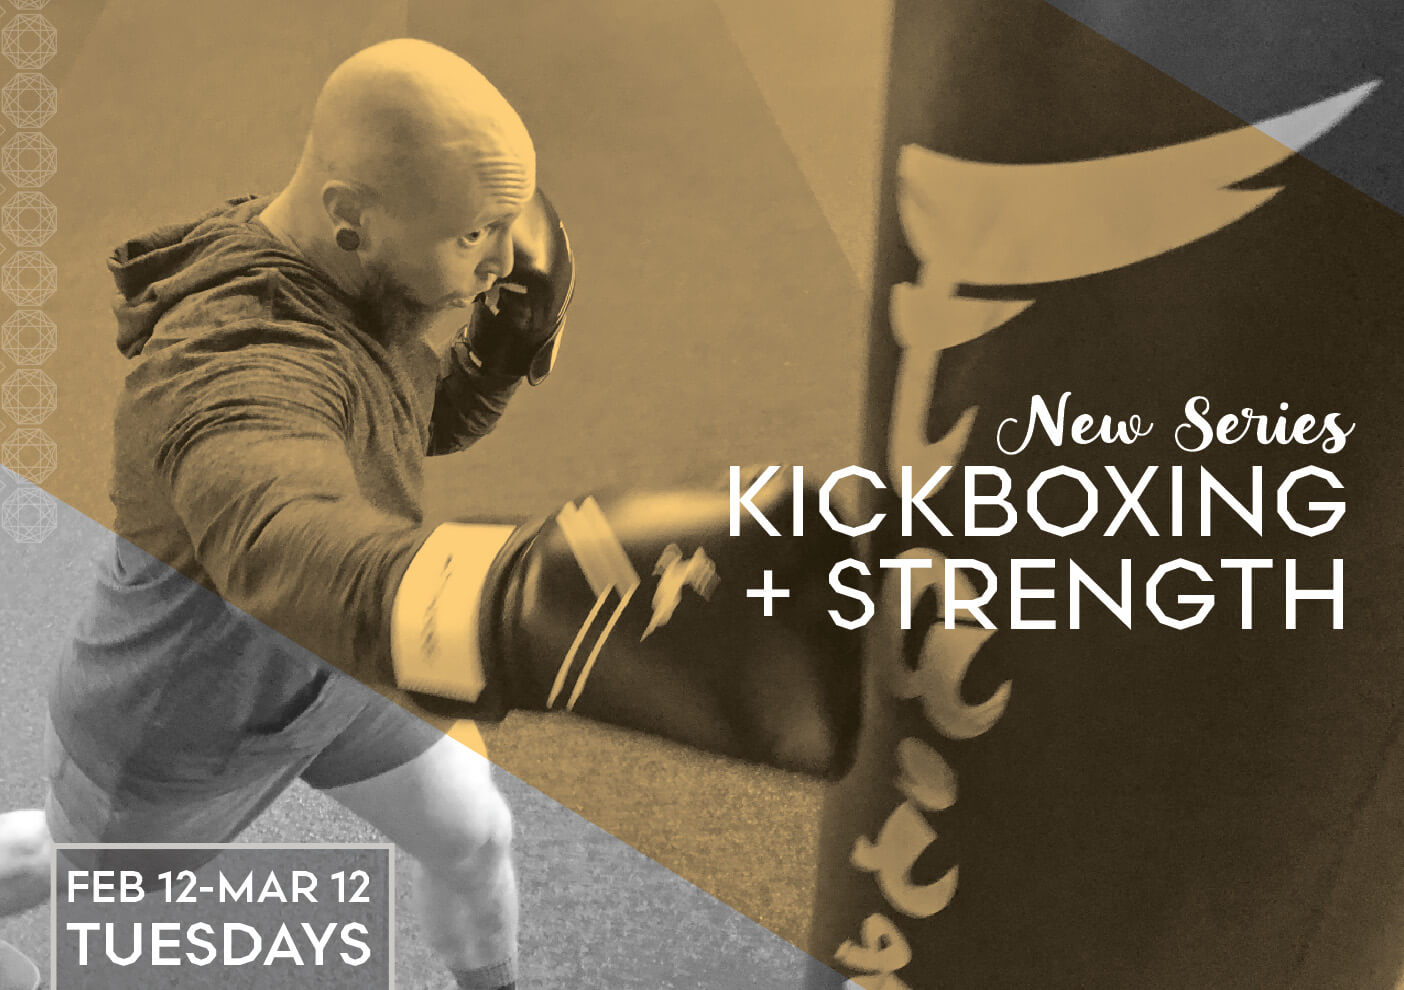 Kickboxing + Strength